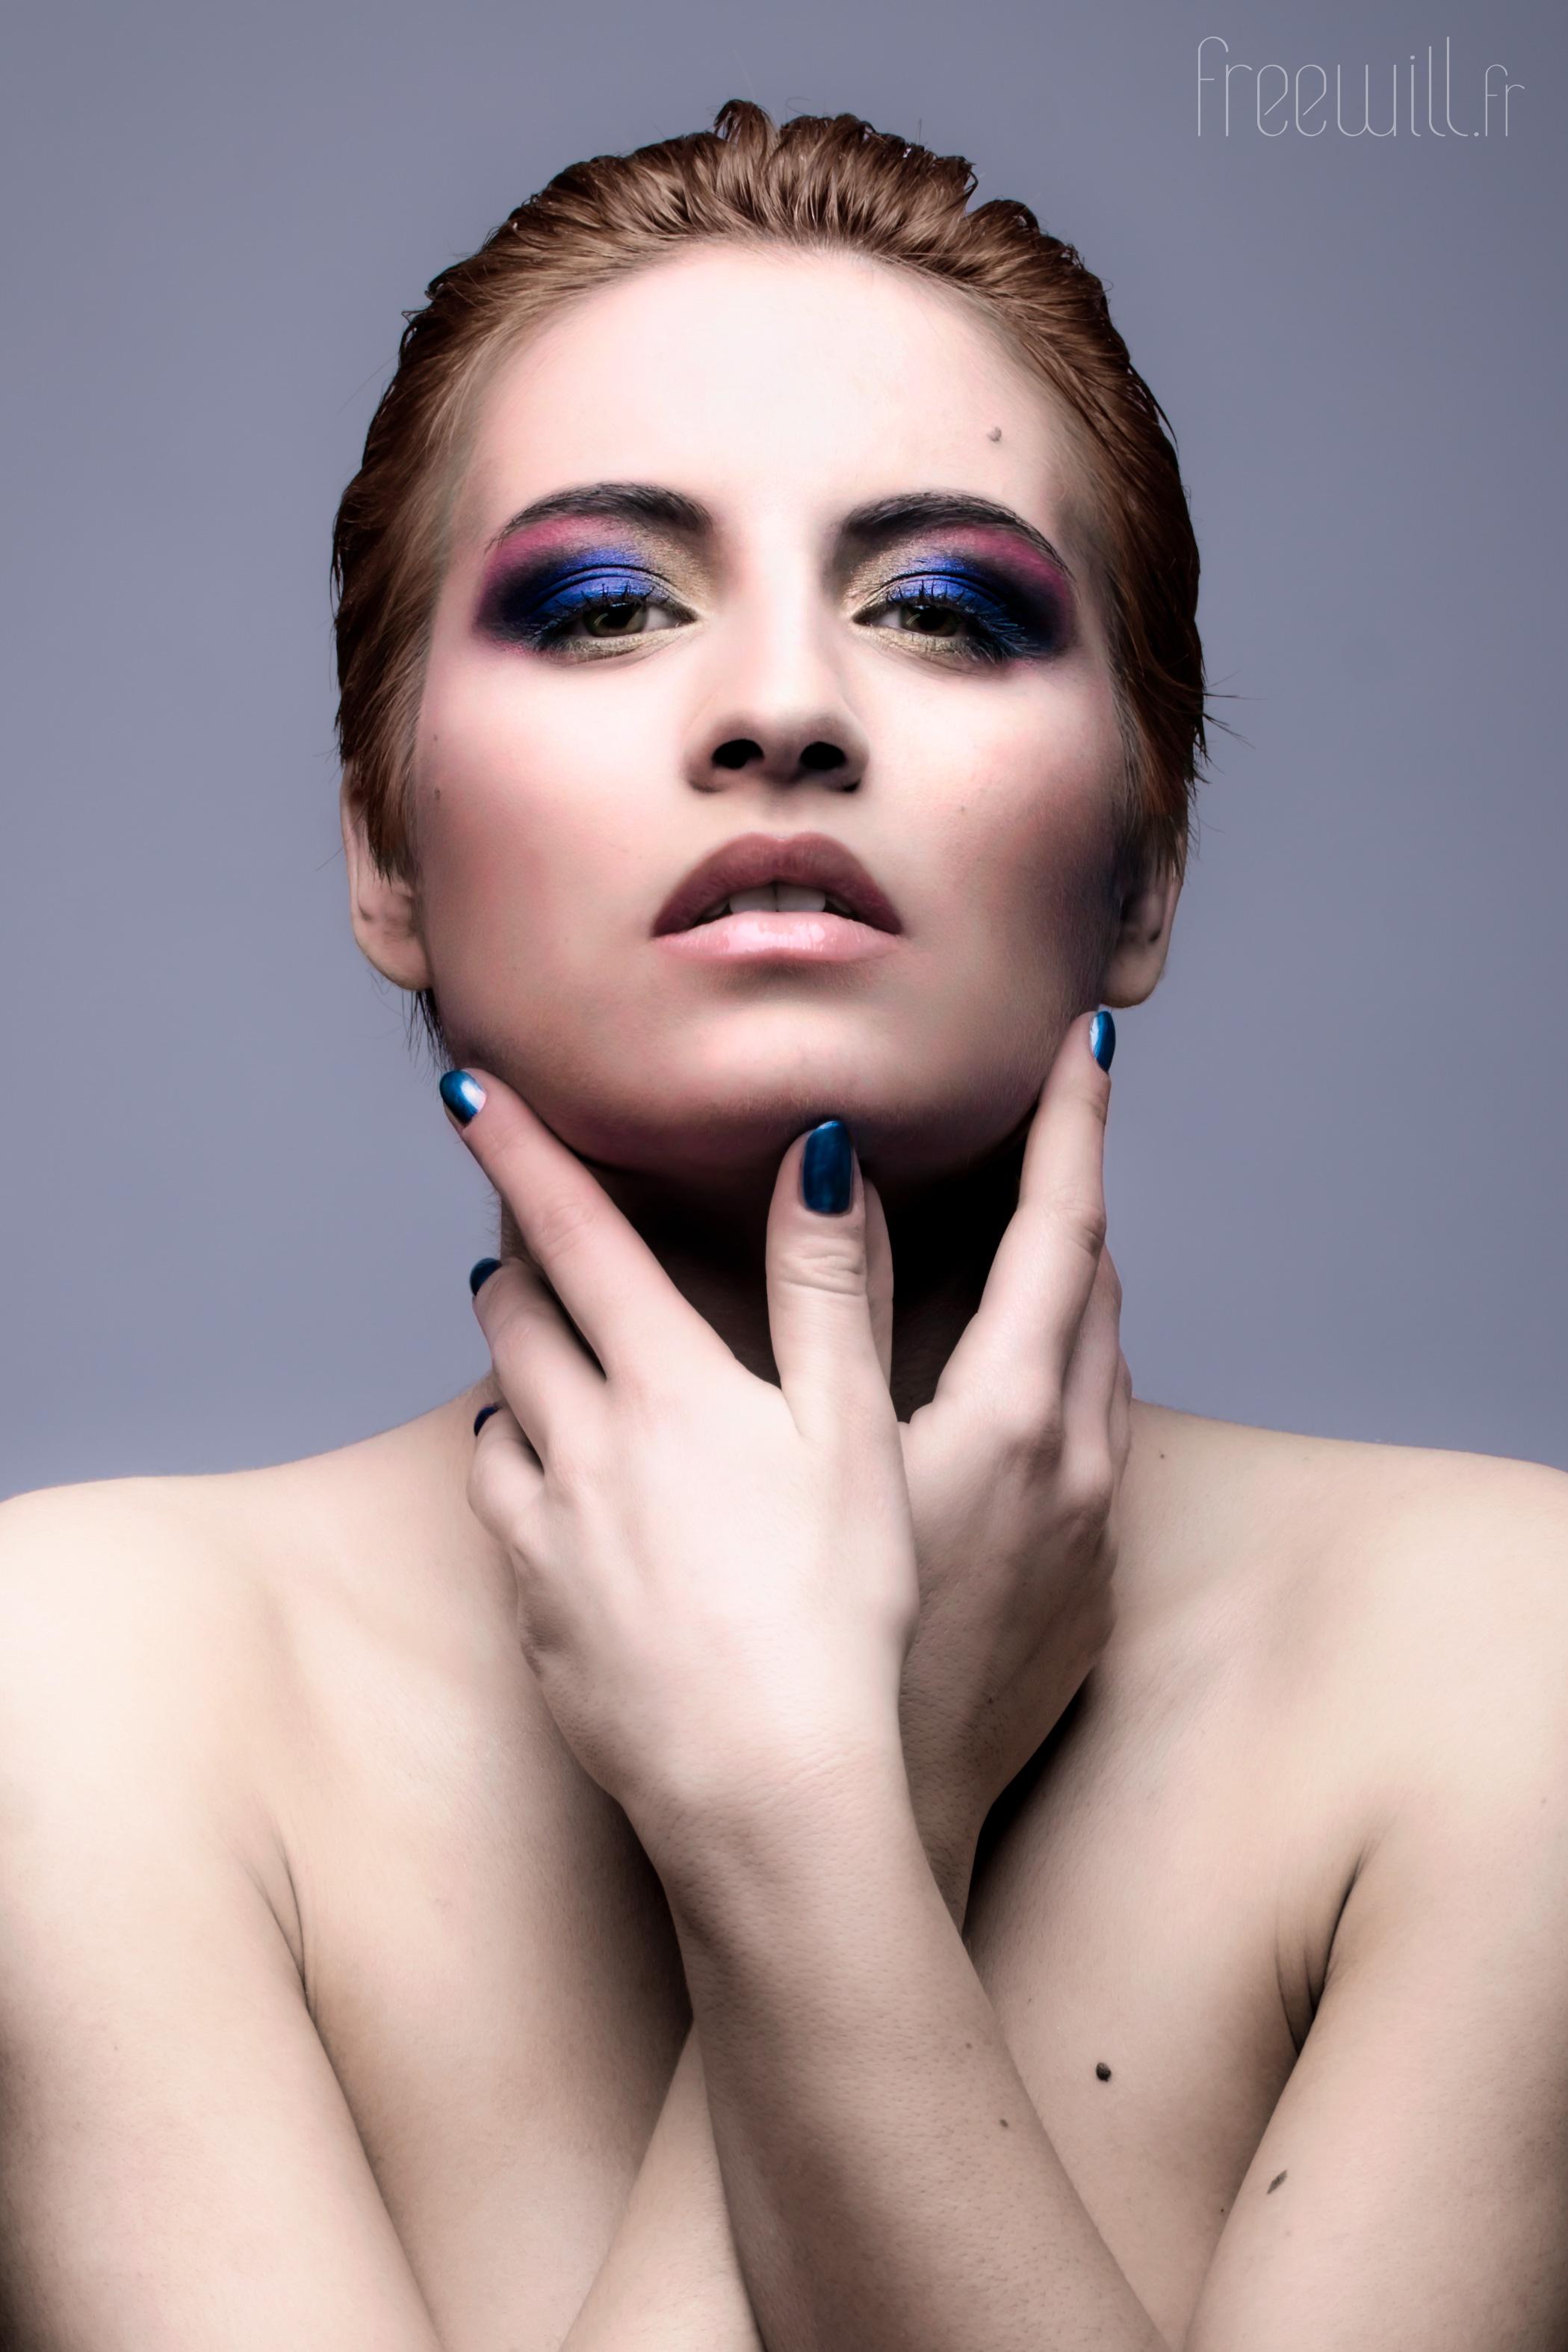 Makeup-Couleur-Crop.jpg